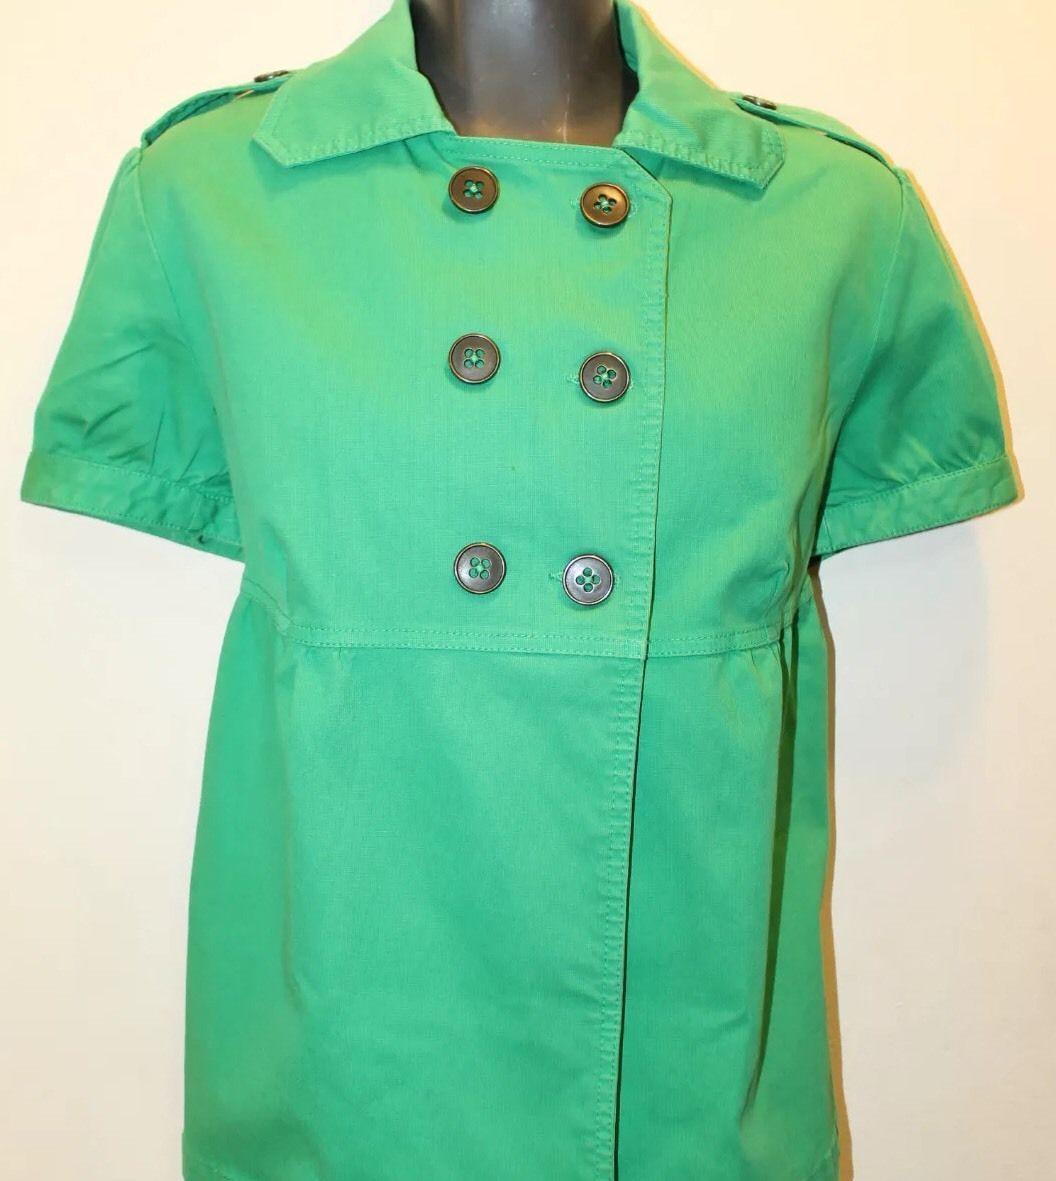 5d86ca28 Original Zara TRF Spring Summer Green Shorts and 50 similar items